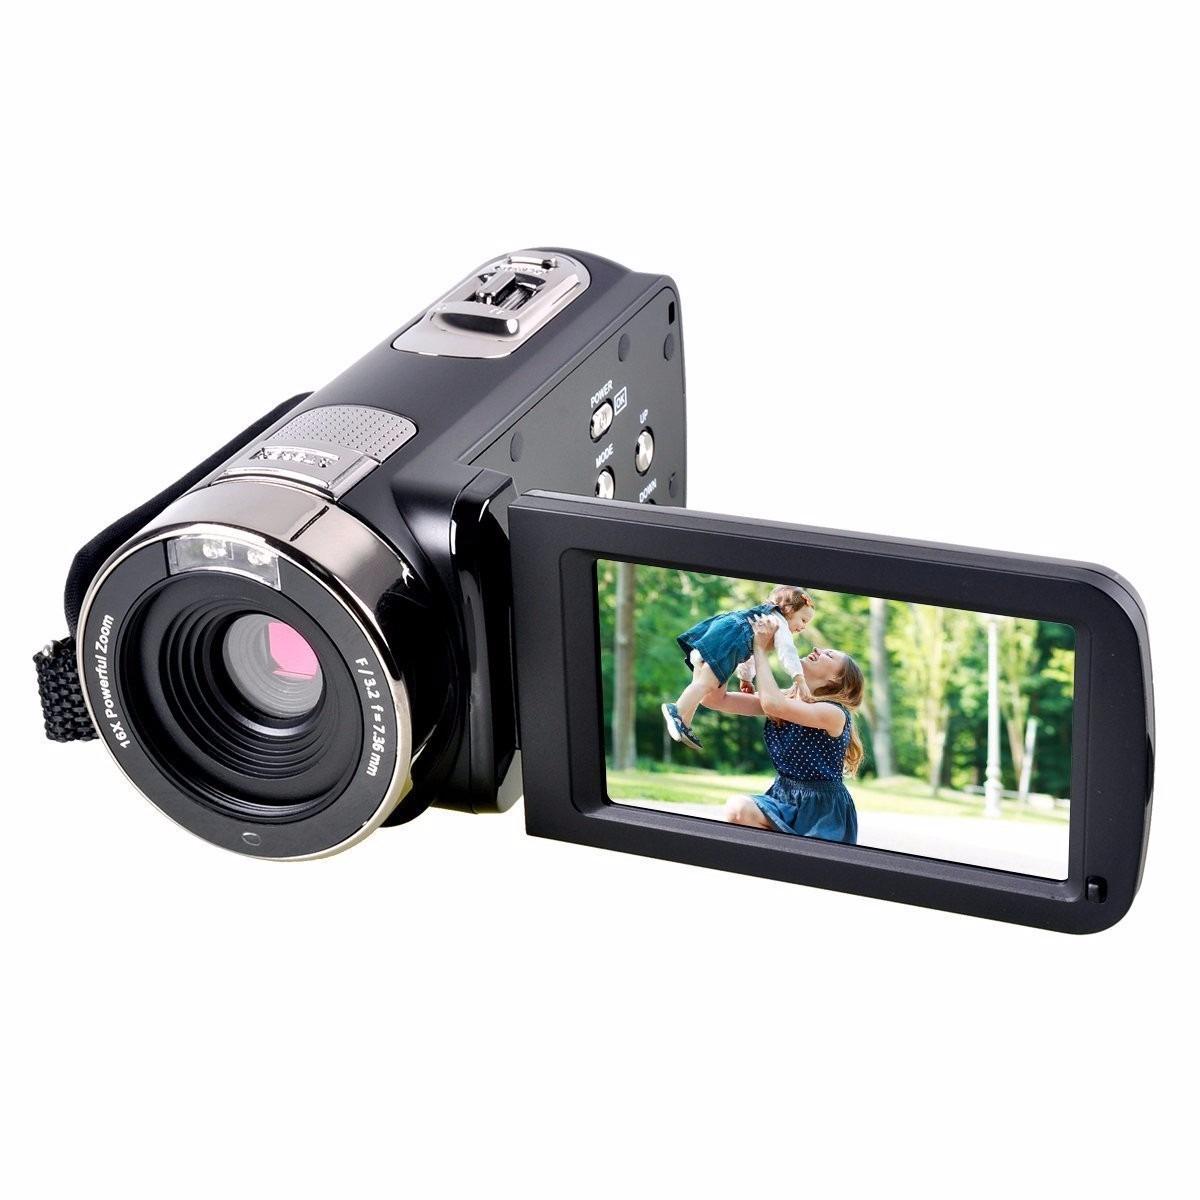 Videocámara Powerlead Pl301 Hd 1080p Ir Night Vision 24.0 ...